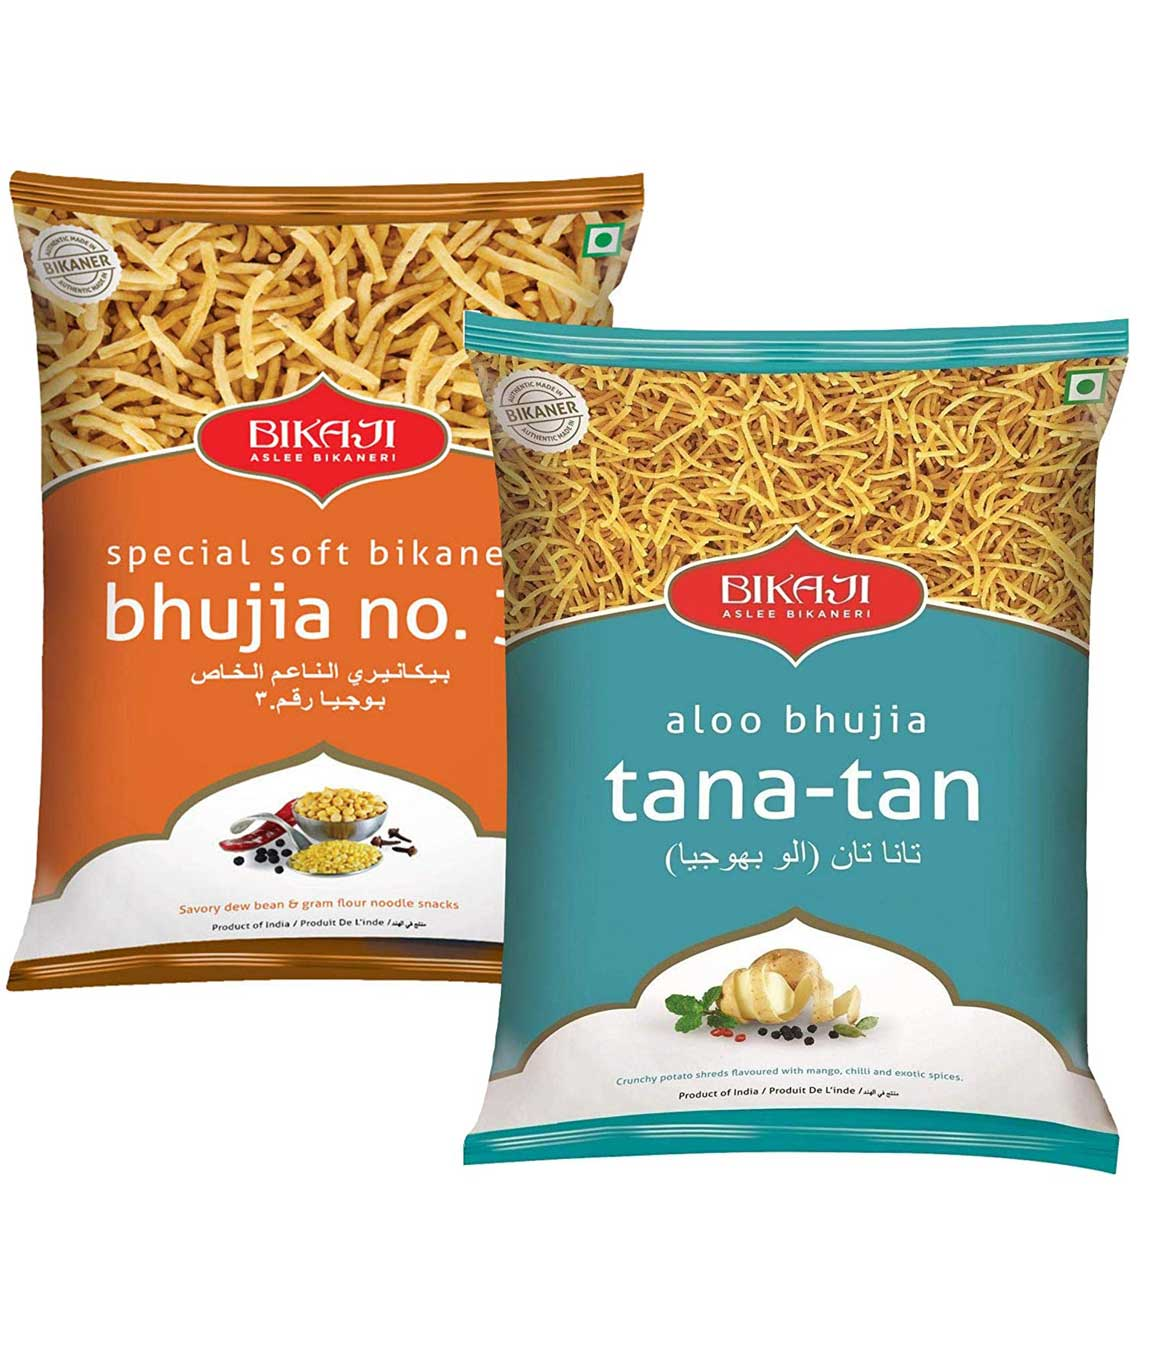 Bikaji Combo Pack - Special Soft Bhujia 400gm - Aloo Bhujia Tana-Tan 400gm - Indian Namkeen Snacks - (Pack of 2)